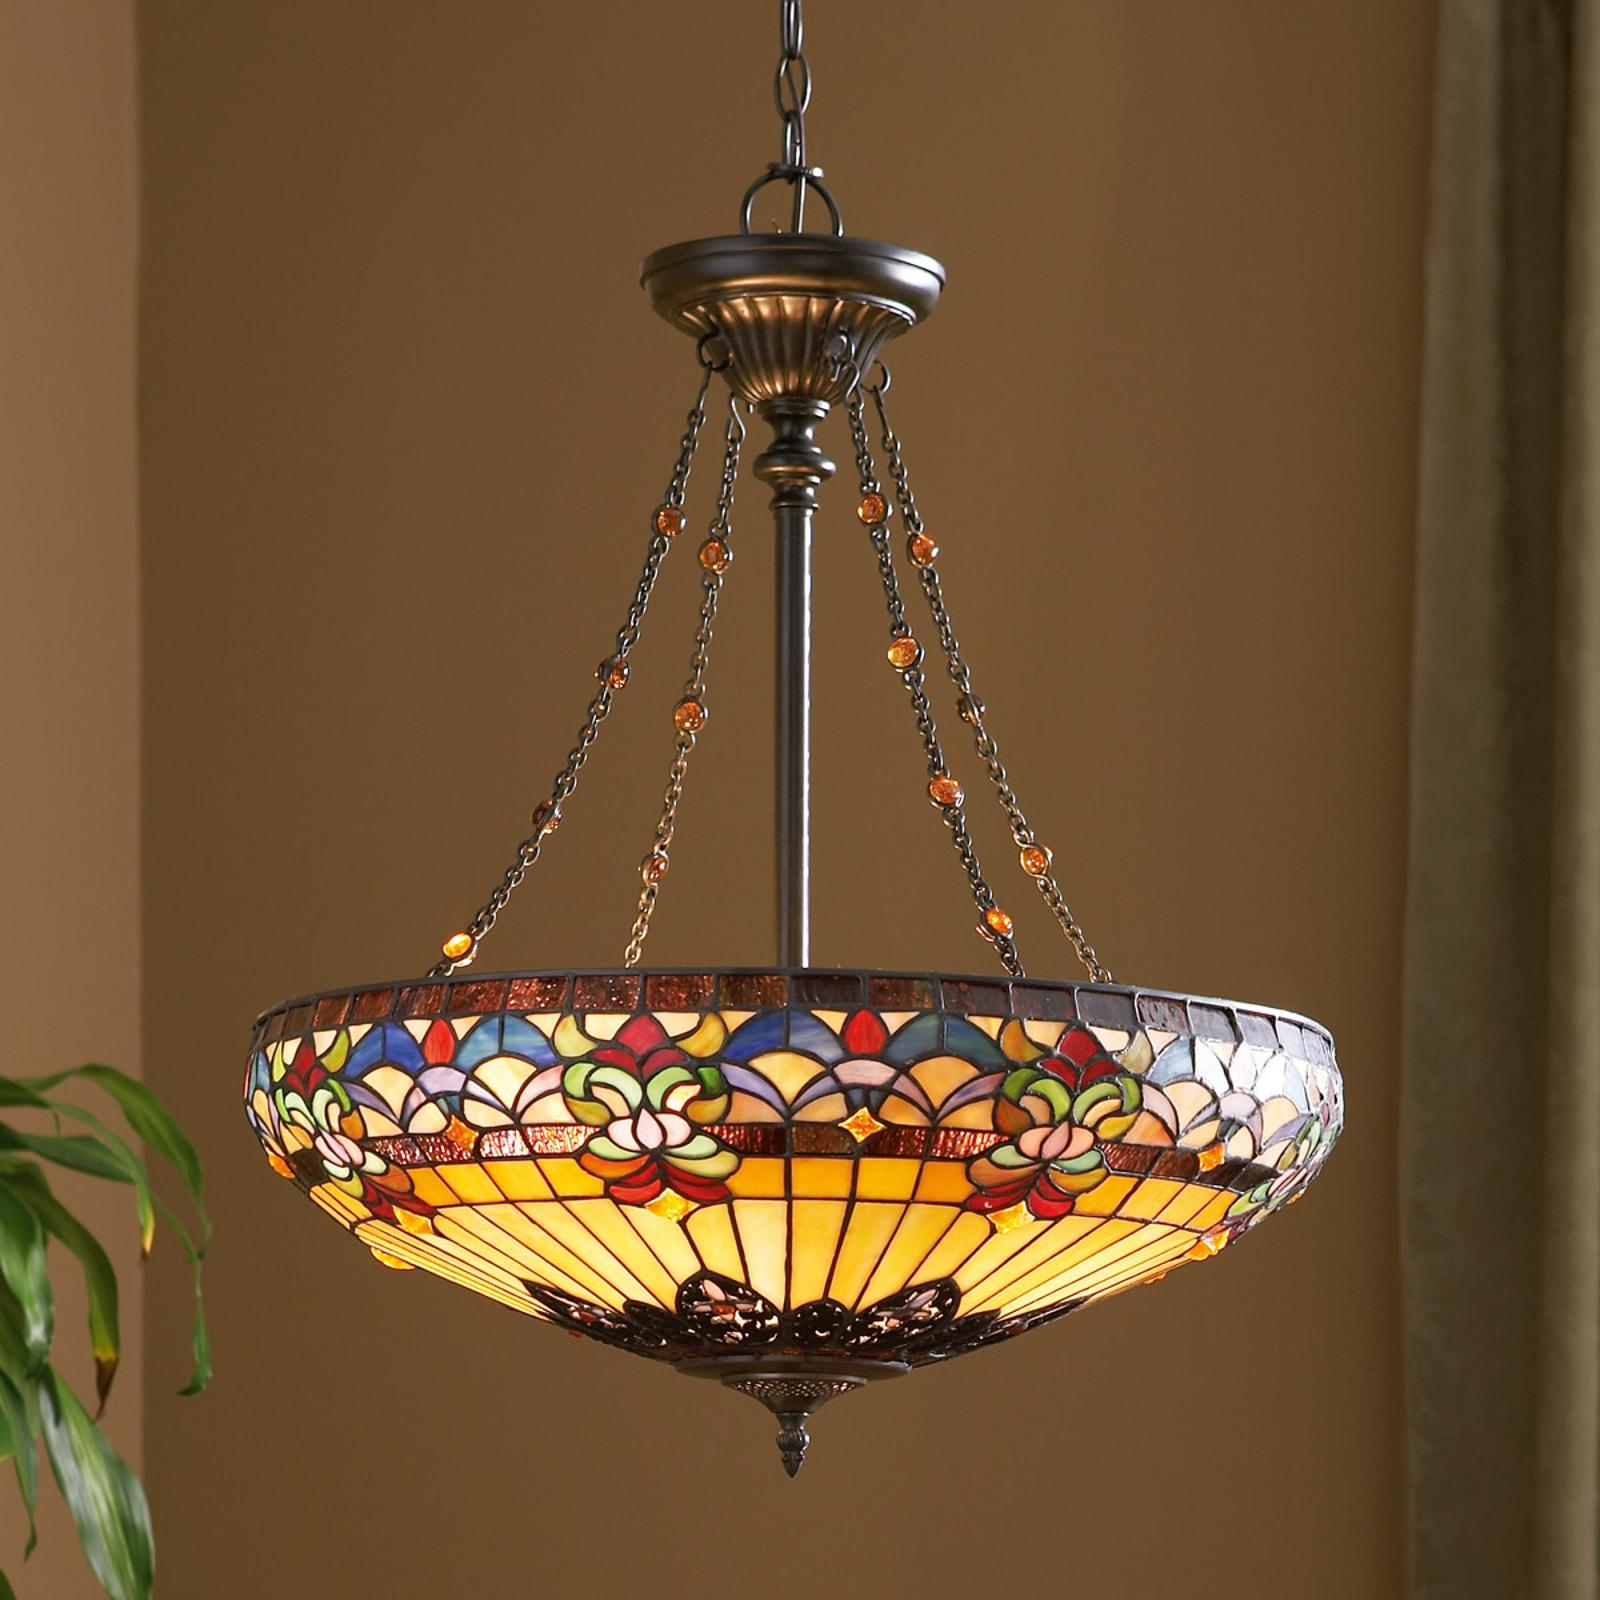 Detailed hanging lamp Belle Fleur_3048347_1